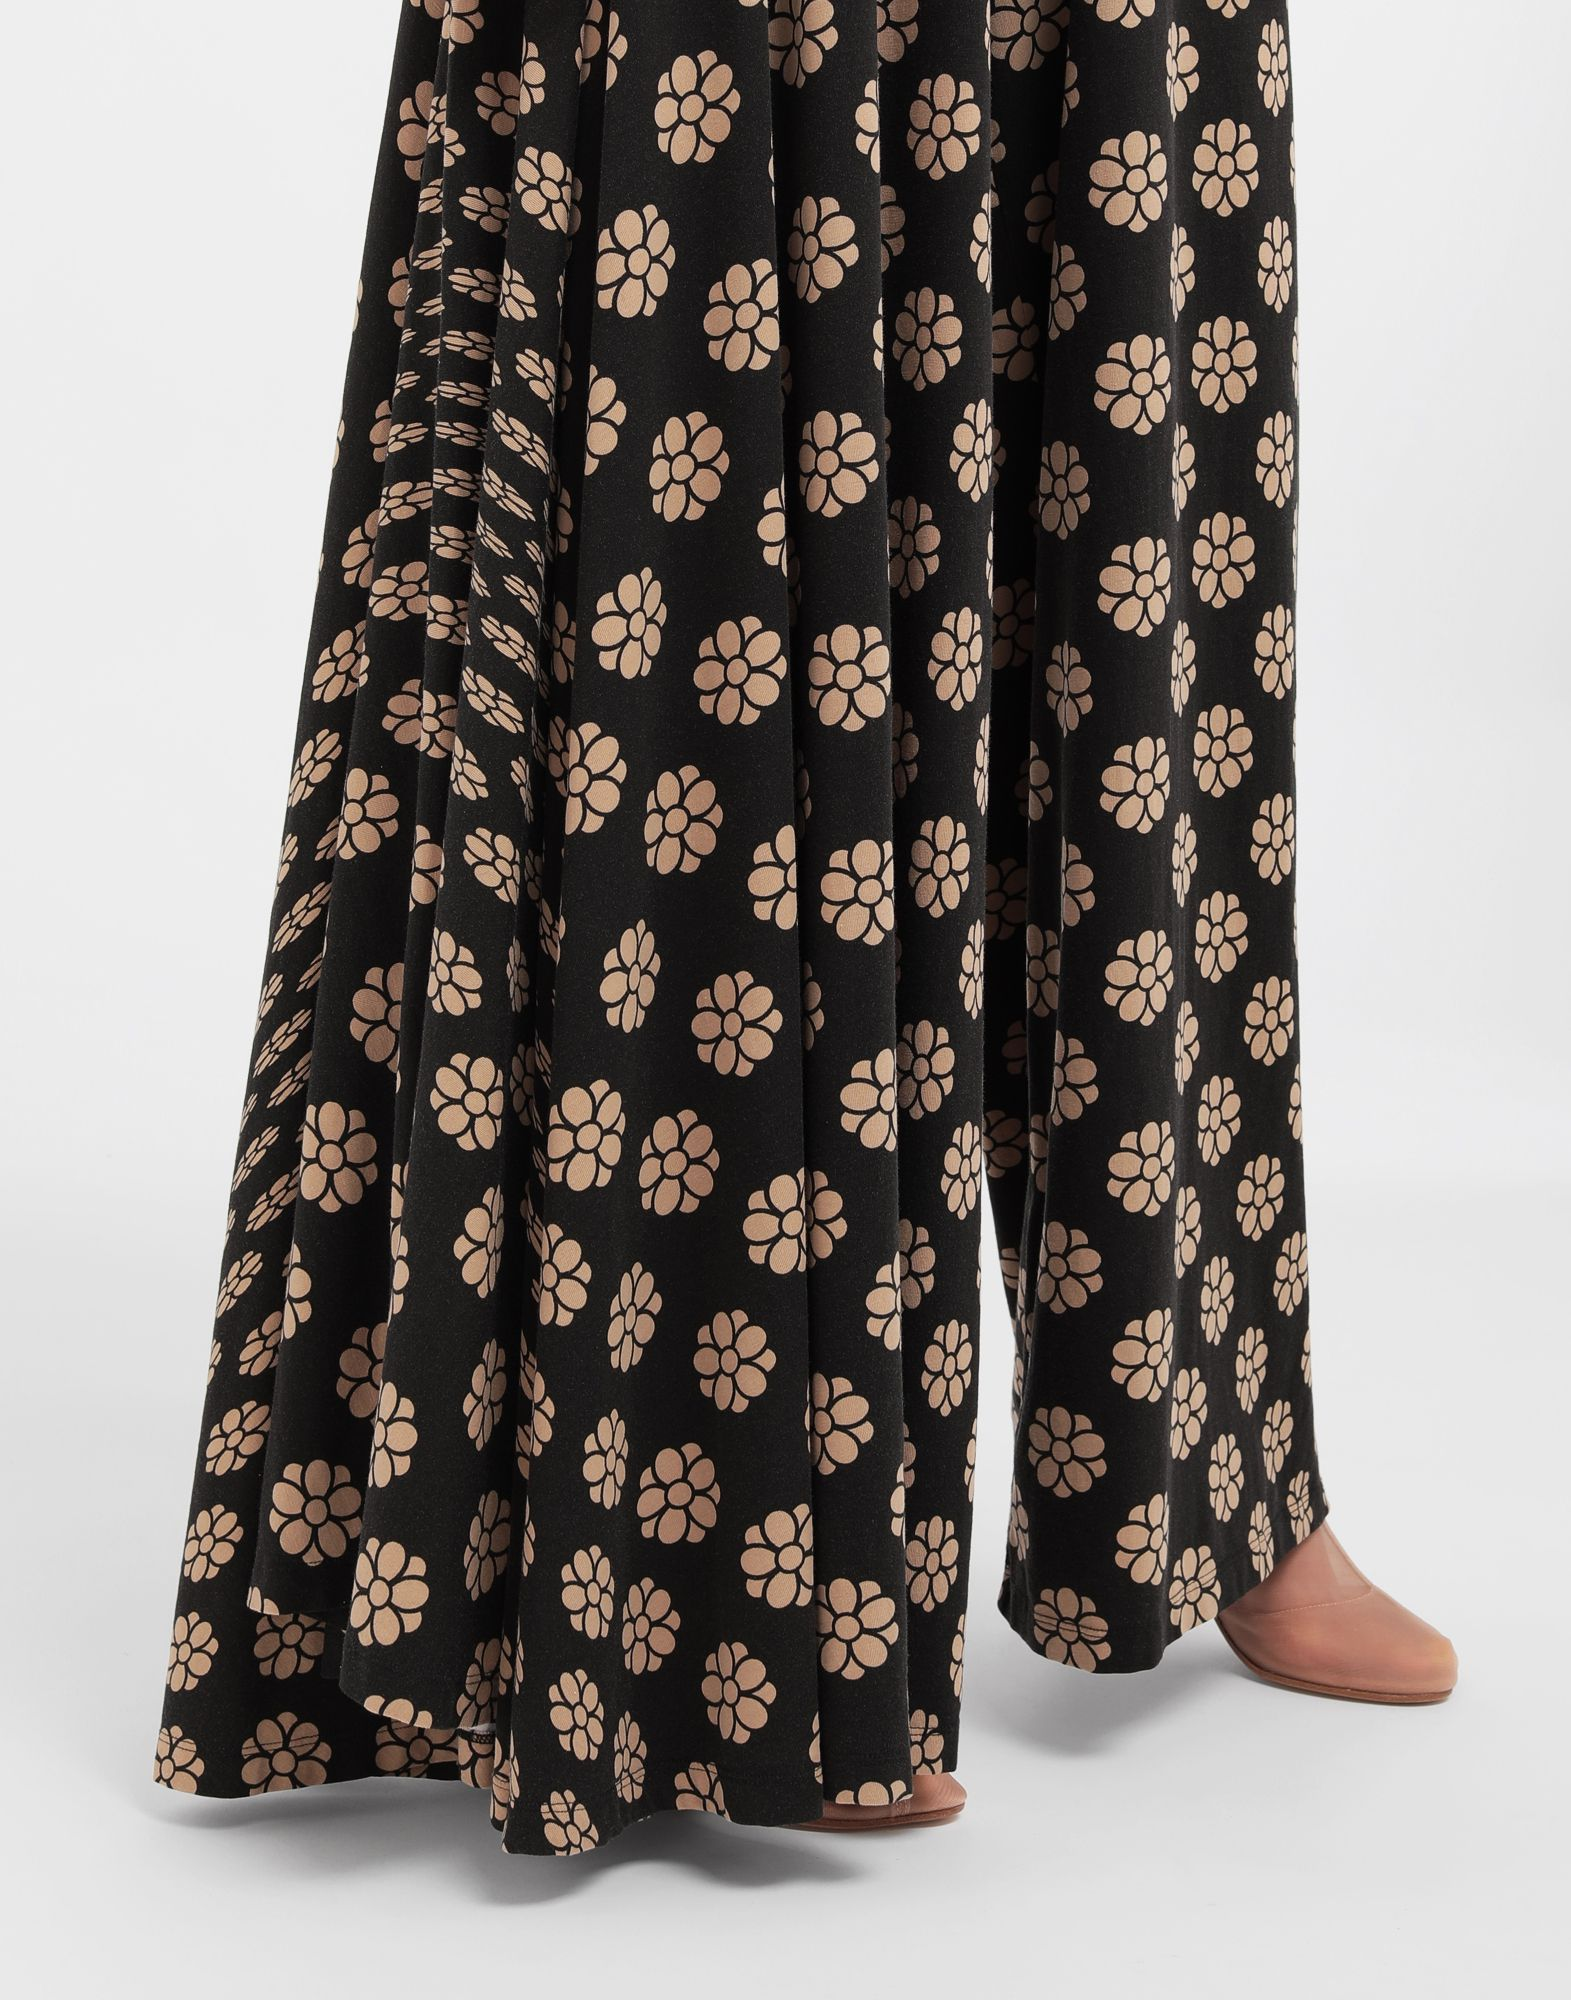 MM6 MAISON MARGIELA Polka dot flower-print pants Trousers Woman a